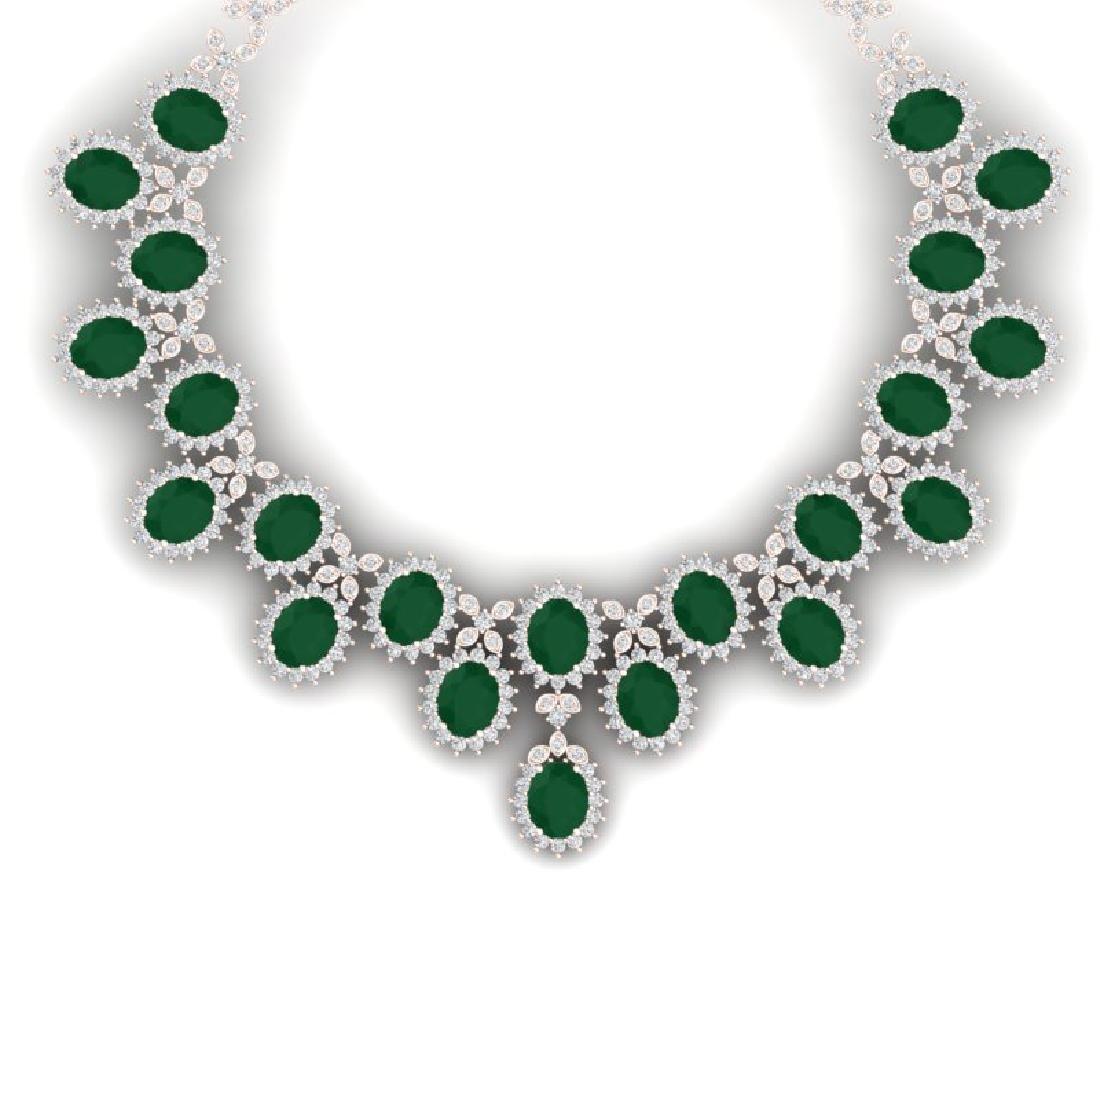 81 CTW Royalty Emerald & VS Diamond Necklace 18K Rose